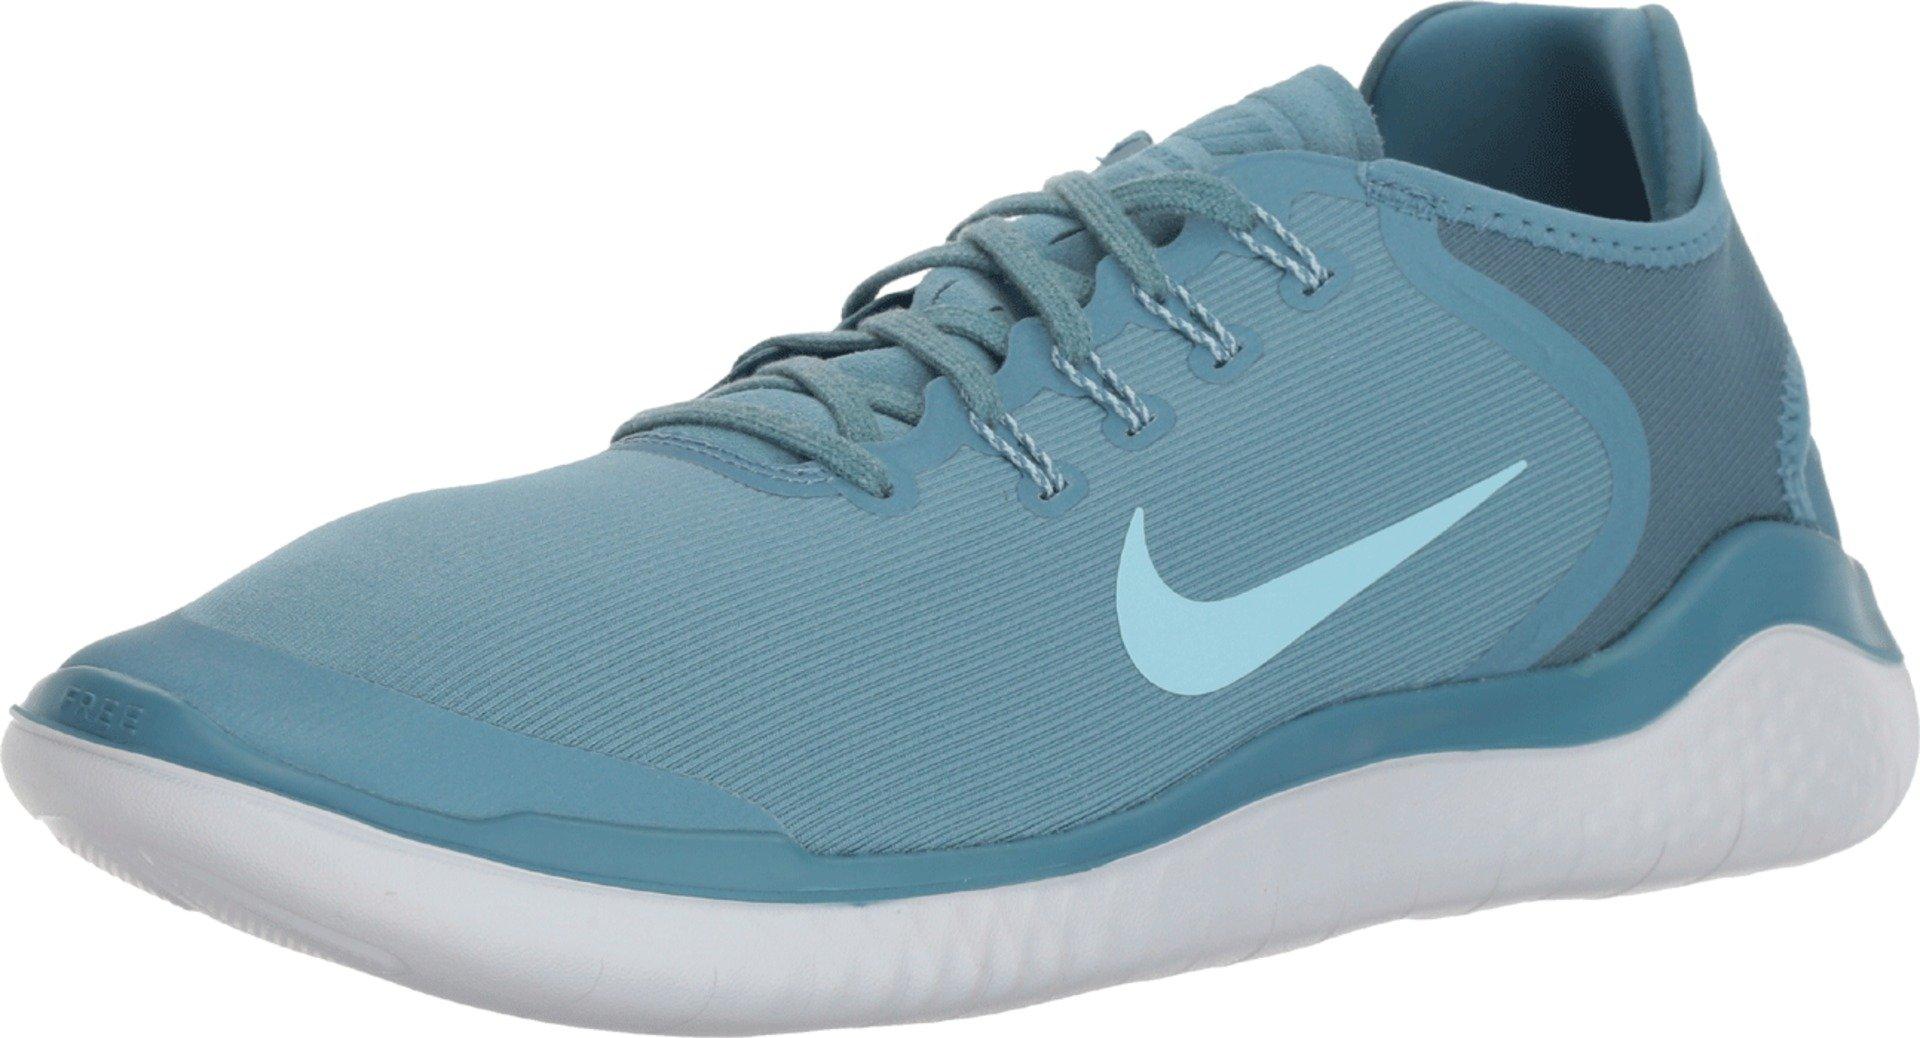 Nike Free RN 2018 Sun Running Shoe (8 D(M) US, Noise Aqua/Pure Platinum) by Nike (Image #1)